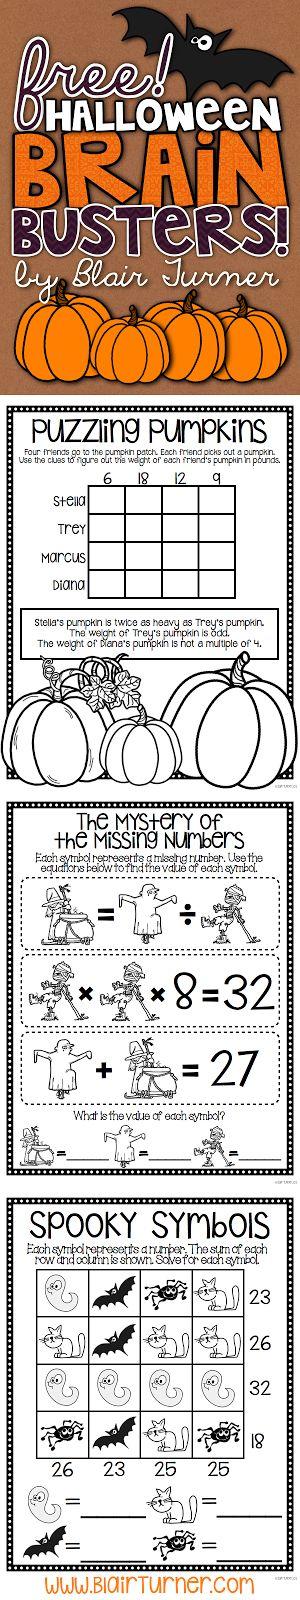 Free Halloween Brain Busters - BlairTurner.com